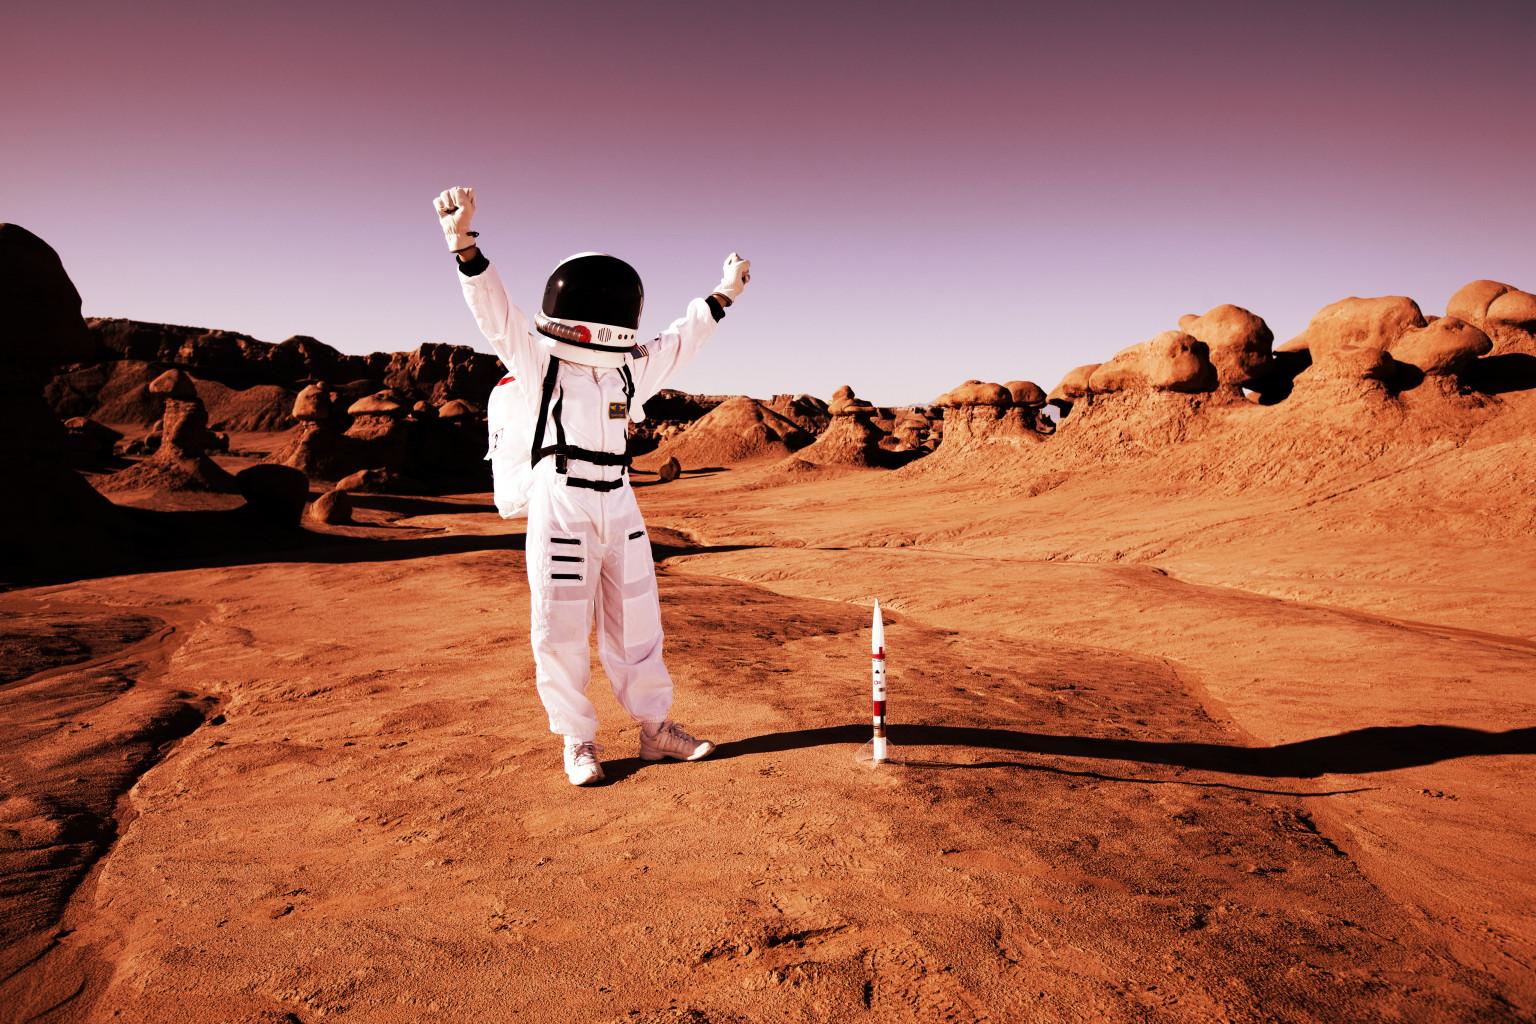 O mars one facebook